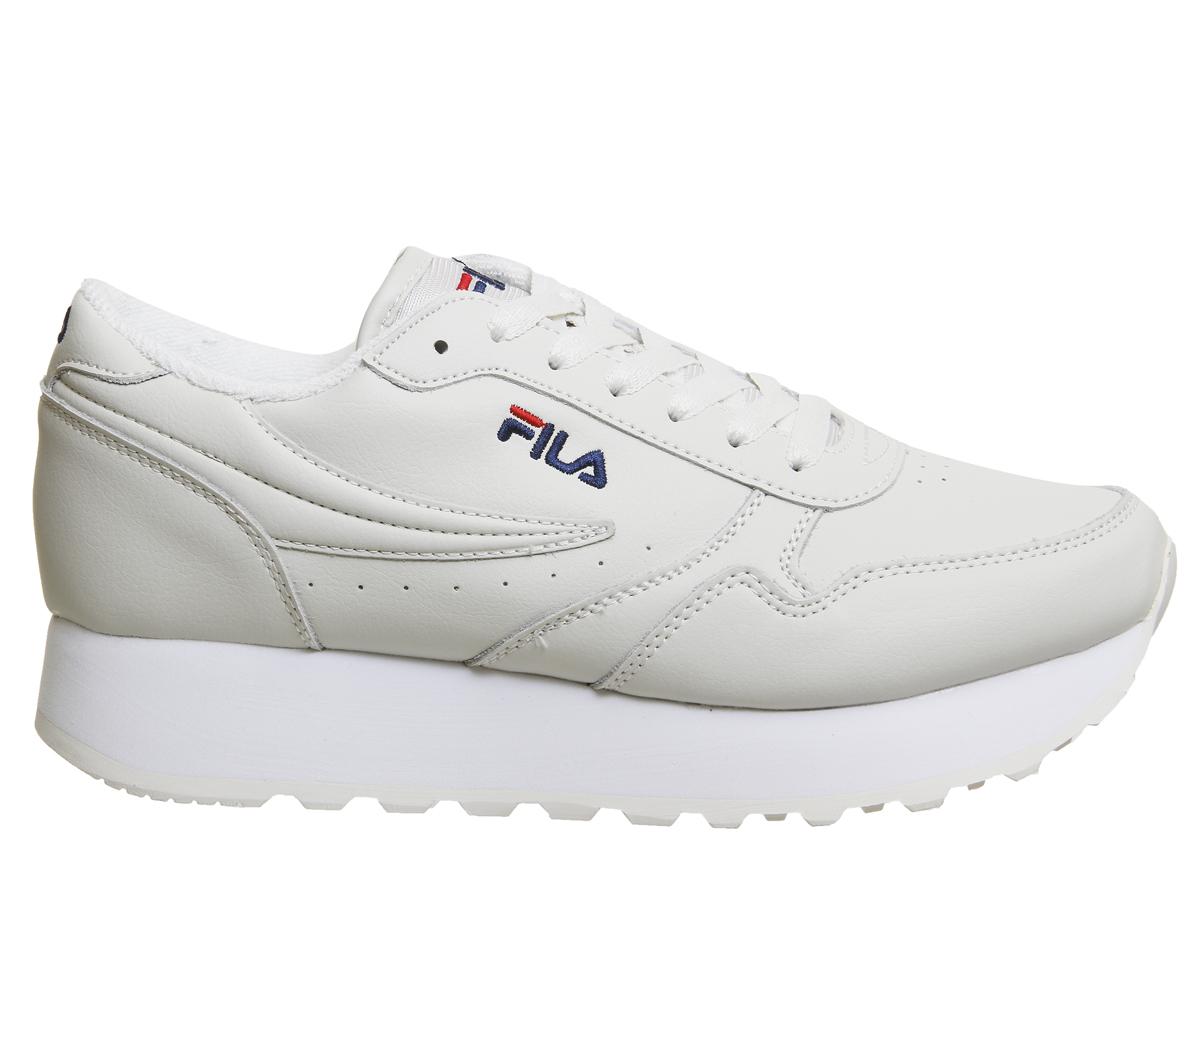 ab2b6c390689 Sentinel Womens Fila Orbit Zeppa Trainers TURTLEDOVE Trainers Shoes